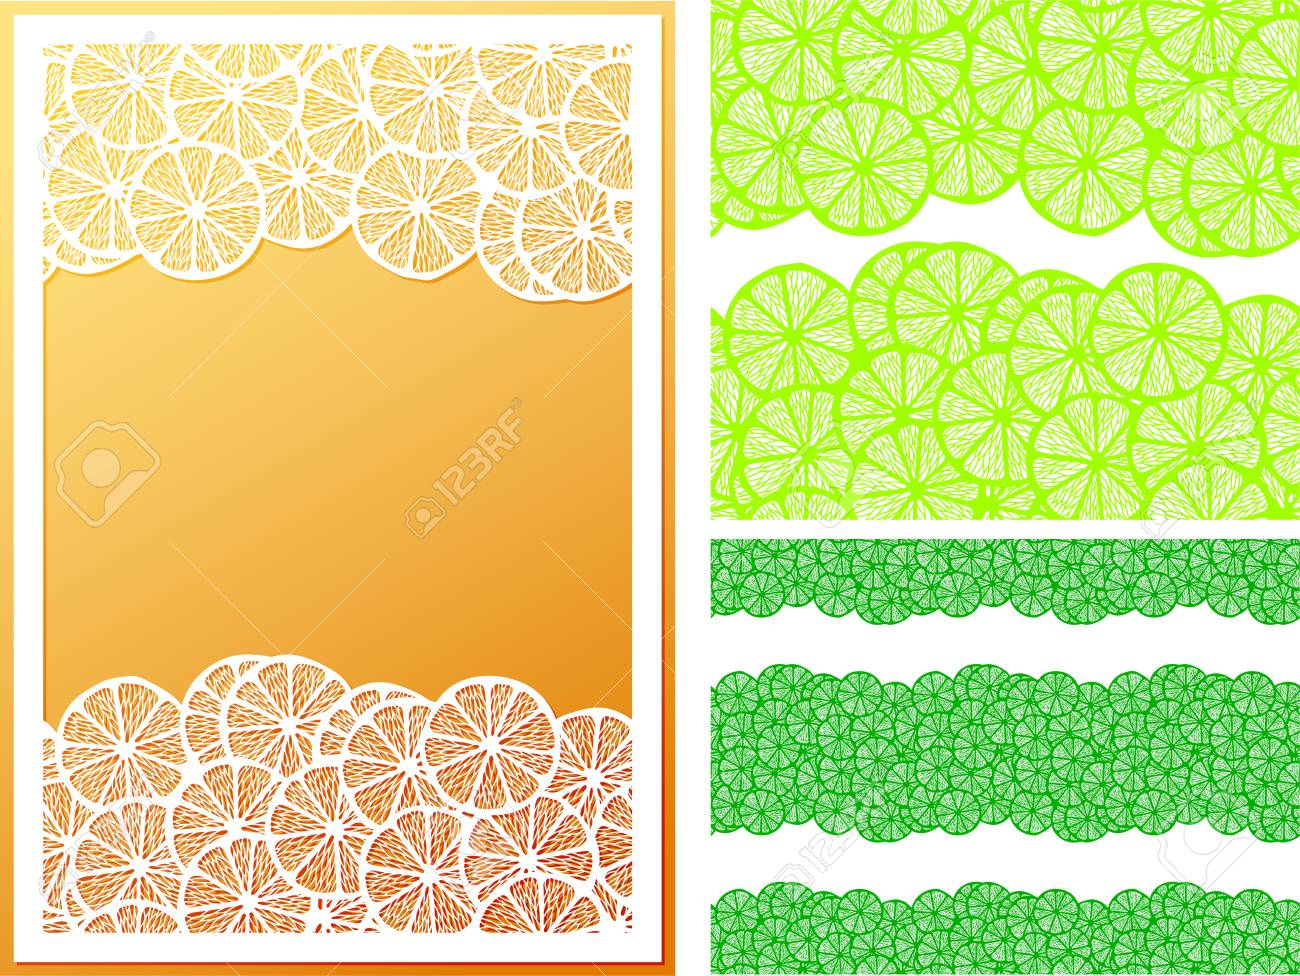 Patrón De Rodajas De Limón Transparente Horizontal Con Usos De ...